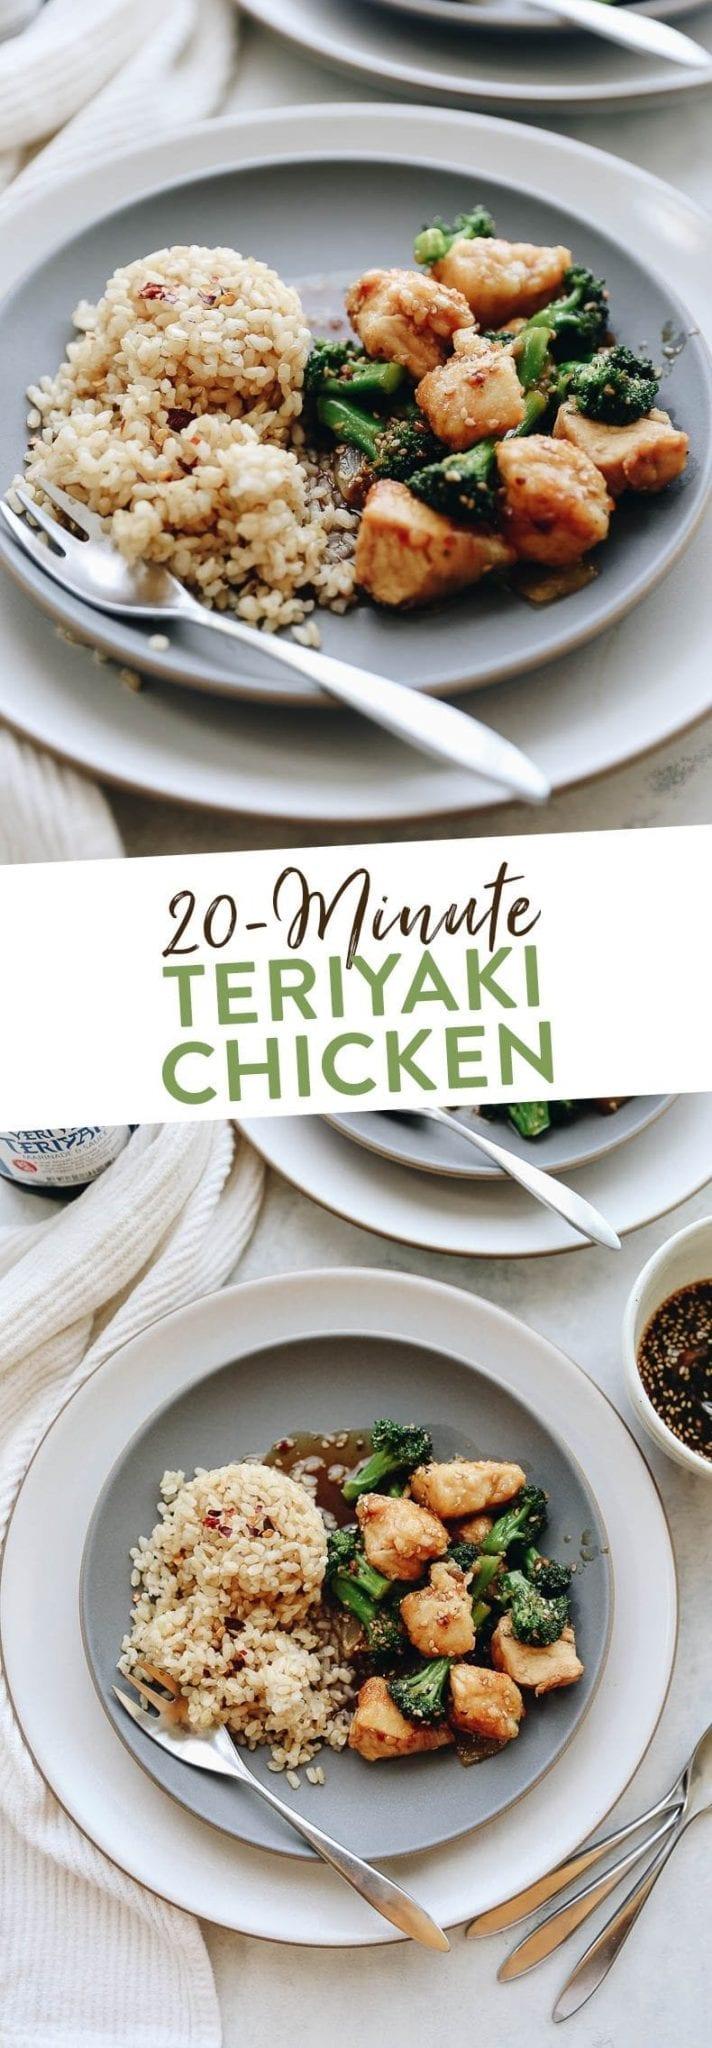 20 MINUTE TERIYAKI CHICKEN THE HEALTHY MAVEN